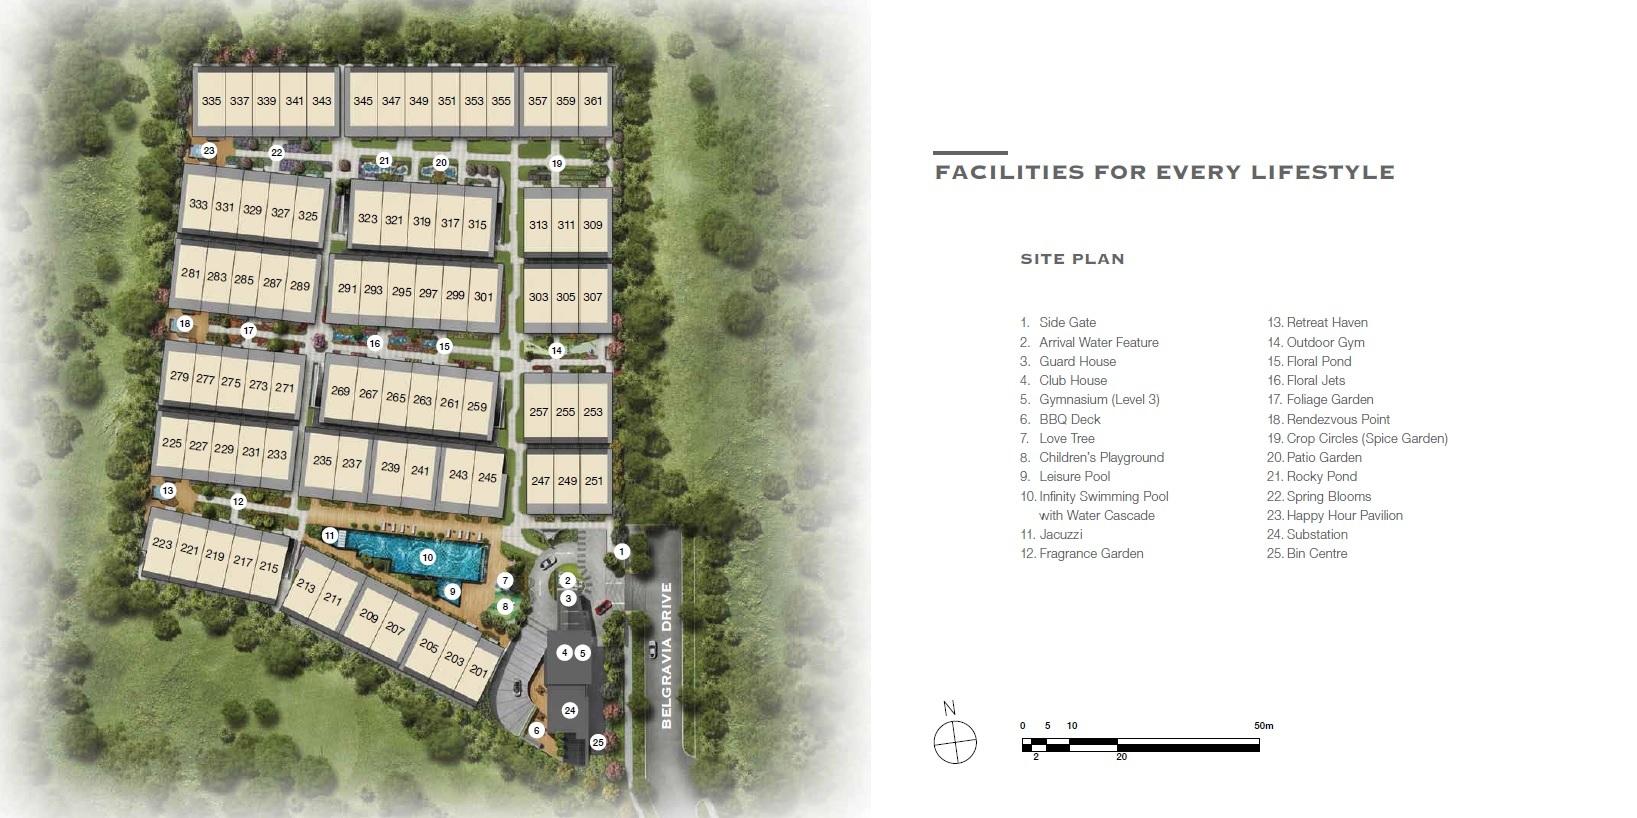 Belgravia Green site plan